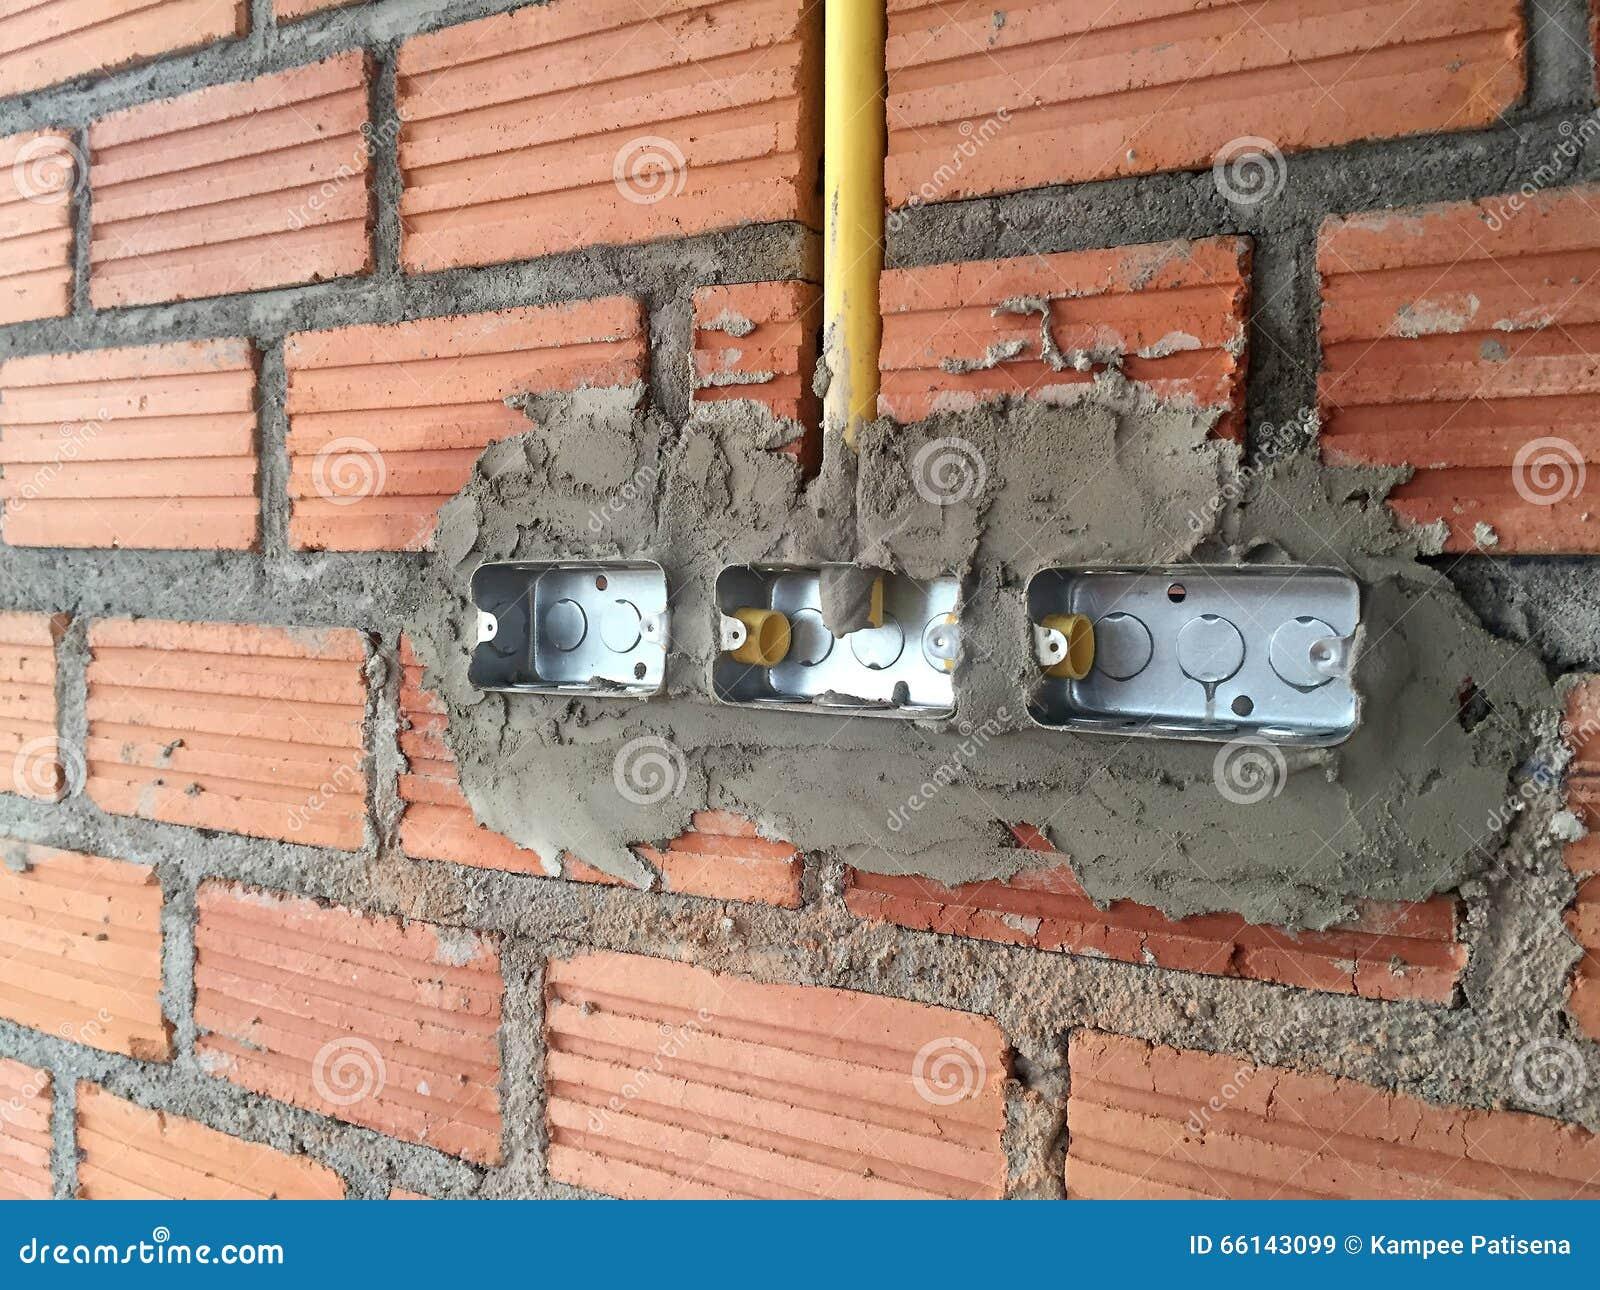 Electric Installation In House - Merzie.net